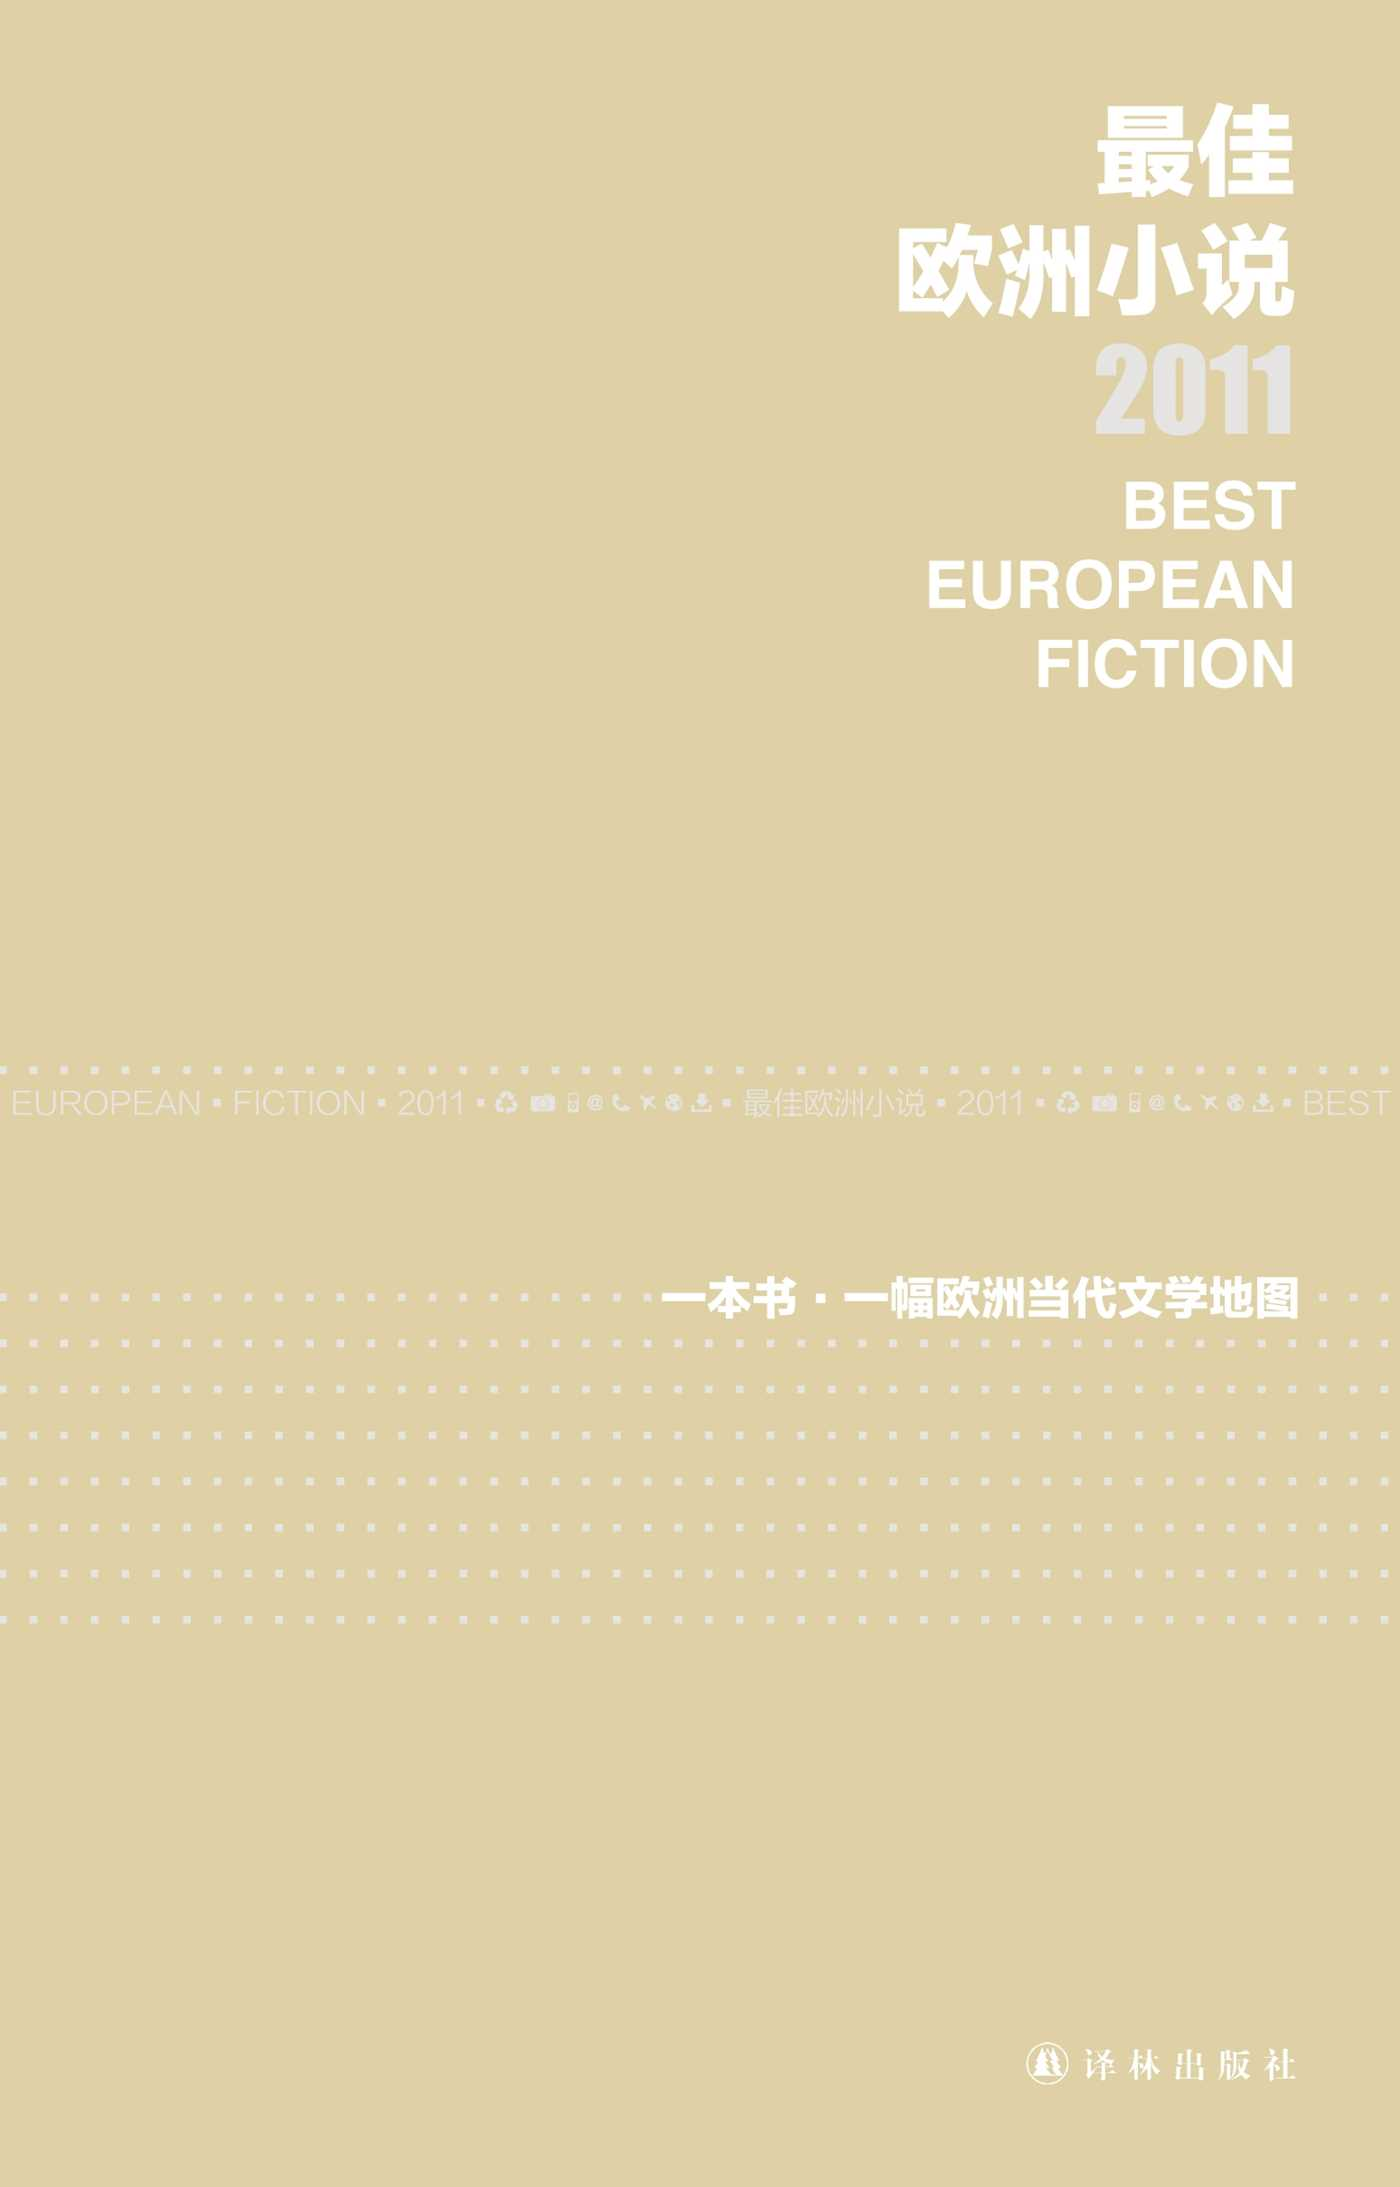 Best european fiction 2011 (mandarin edition) 9787894000699 hr